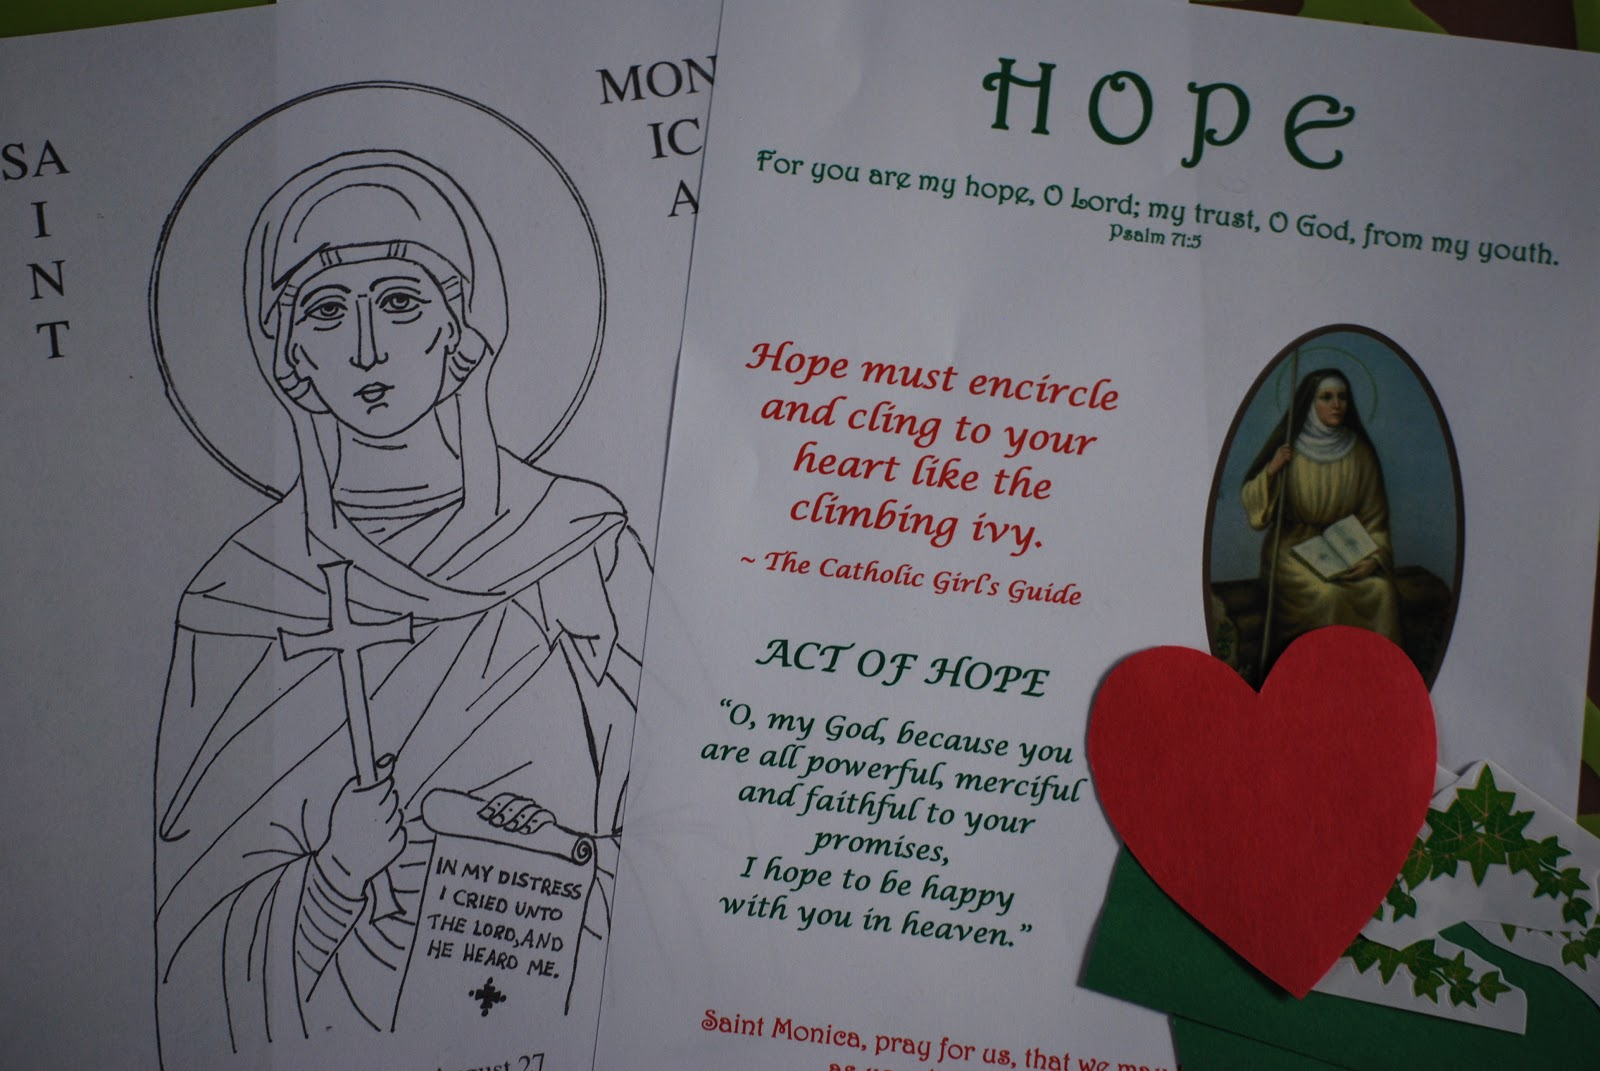 Our Lady of Mount Carmel Little Flowers Girls\' Club: Hope ~ St. Monica